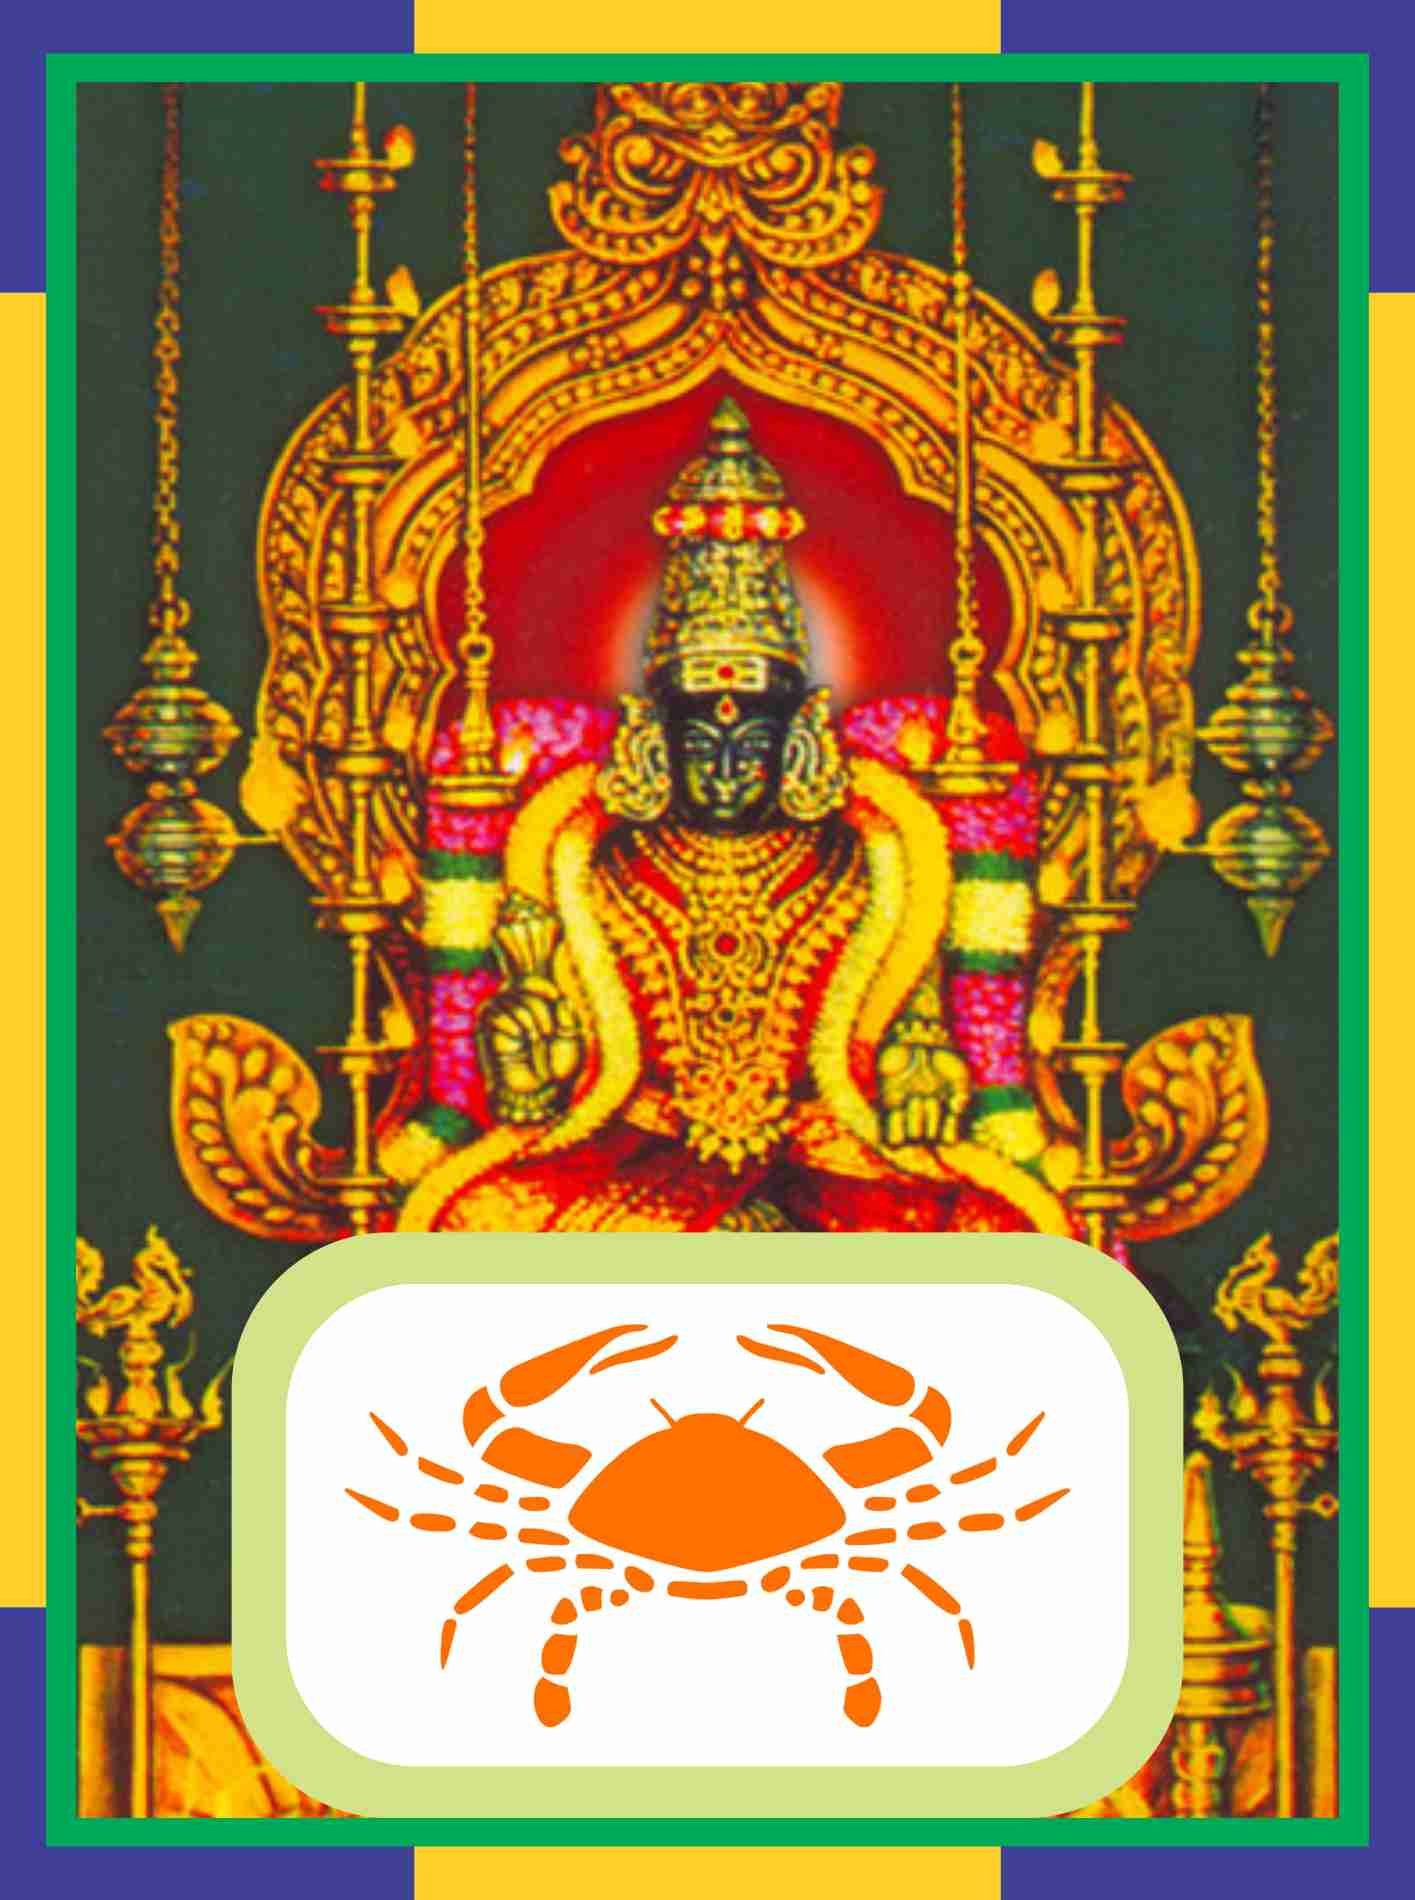 Thirumeeyachur - Lalithambigai Temple Spl Parihara Puja for Kataka Rasi